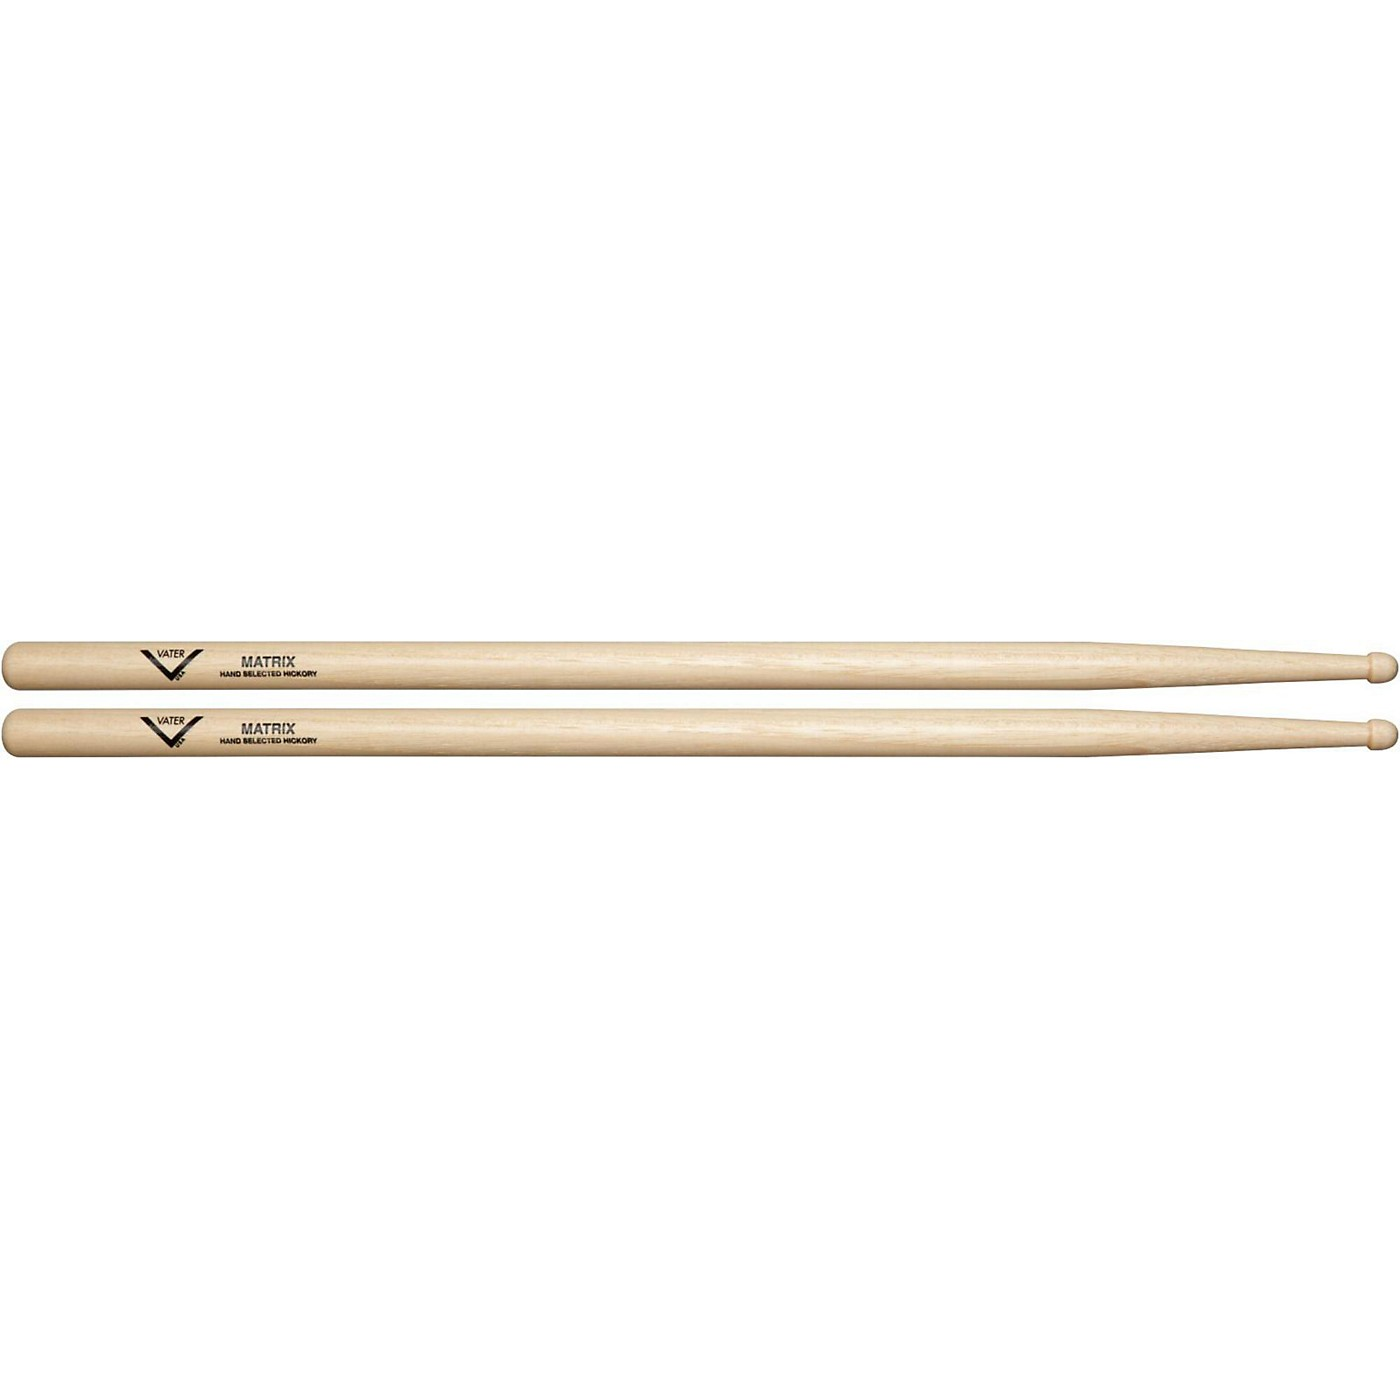 Vater American Hickory Matrix Drumsticks thumbnail